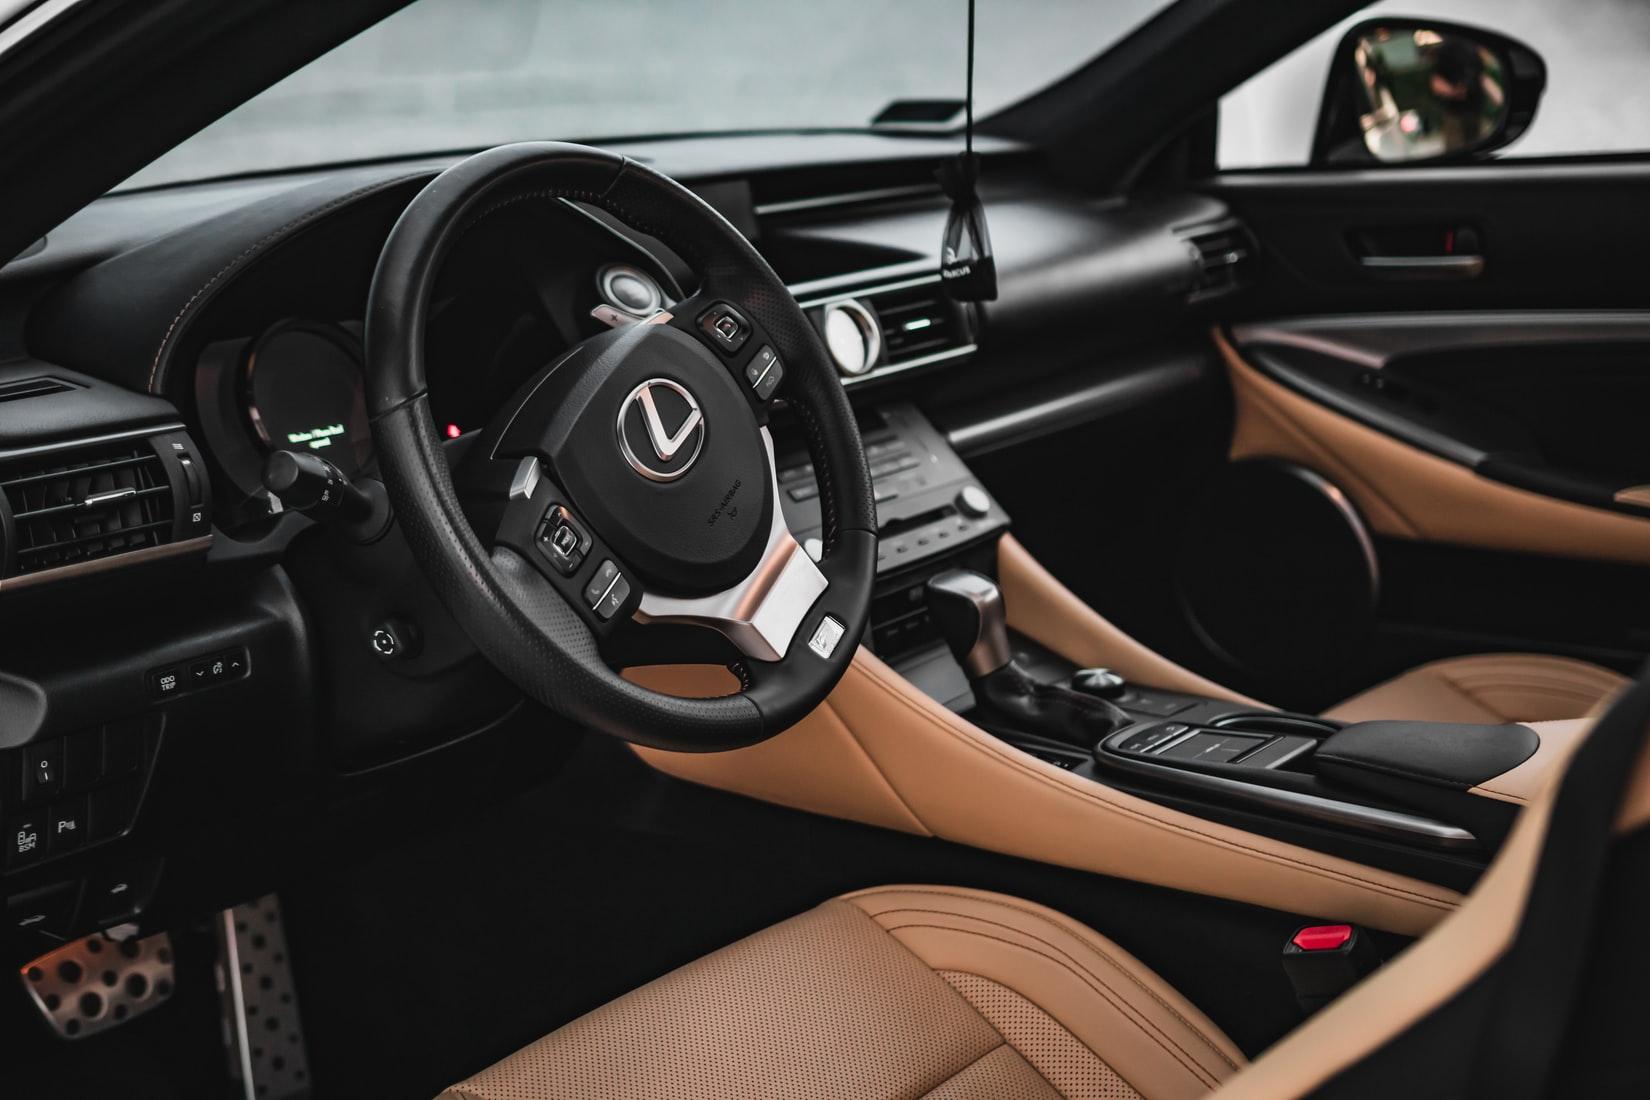 auto-interieur-zwart-bruin